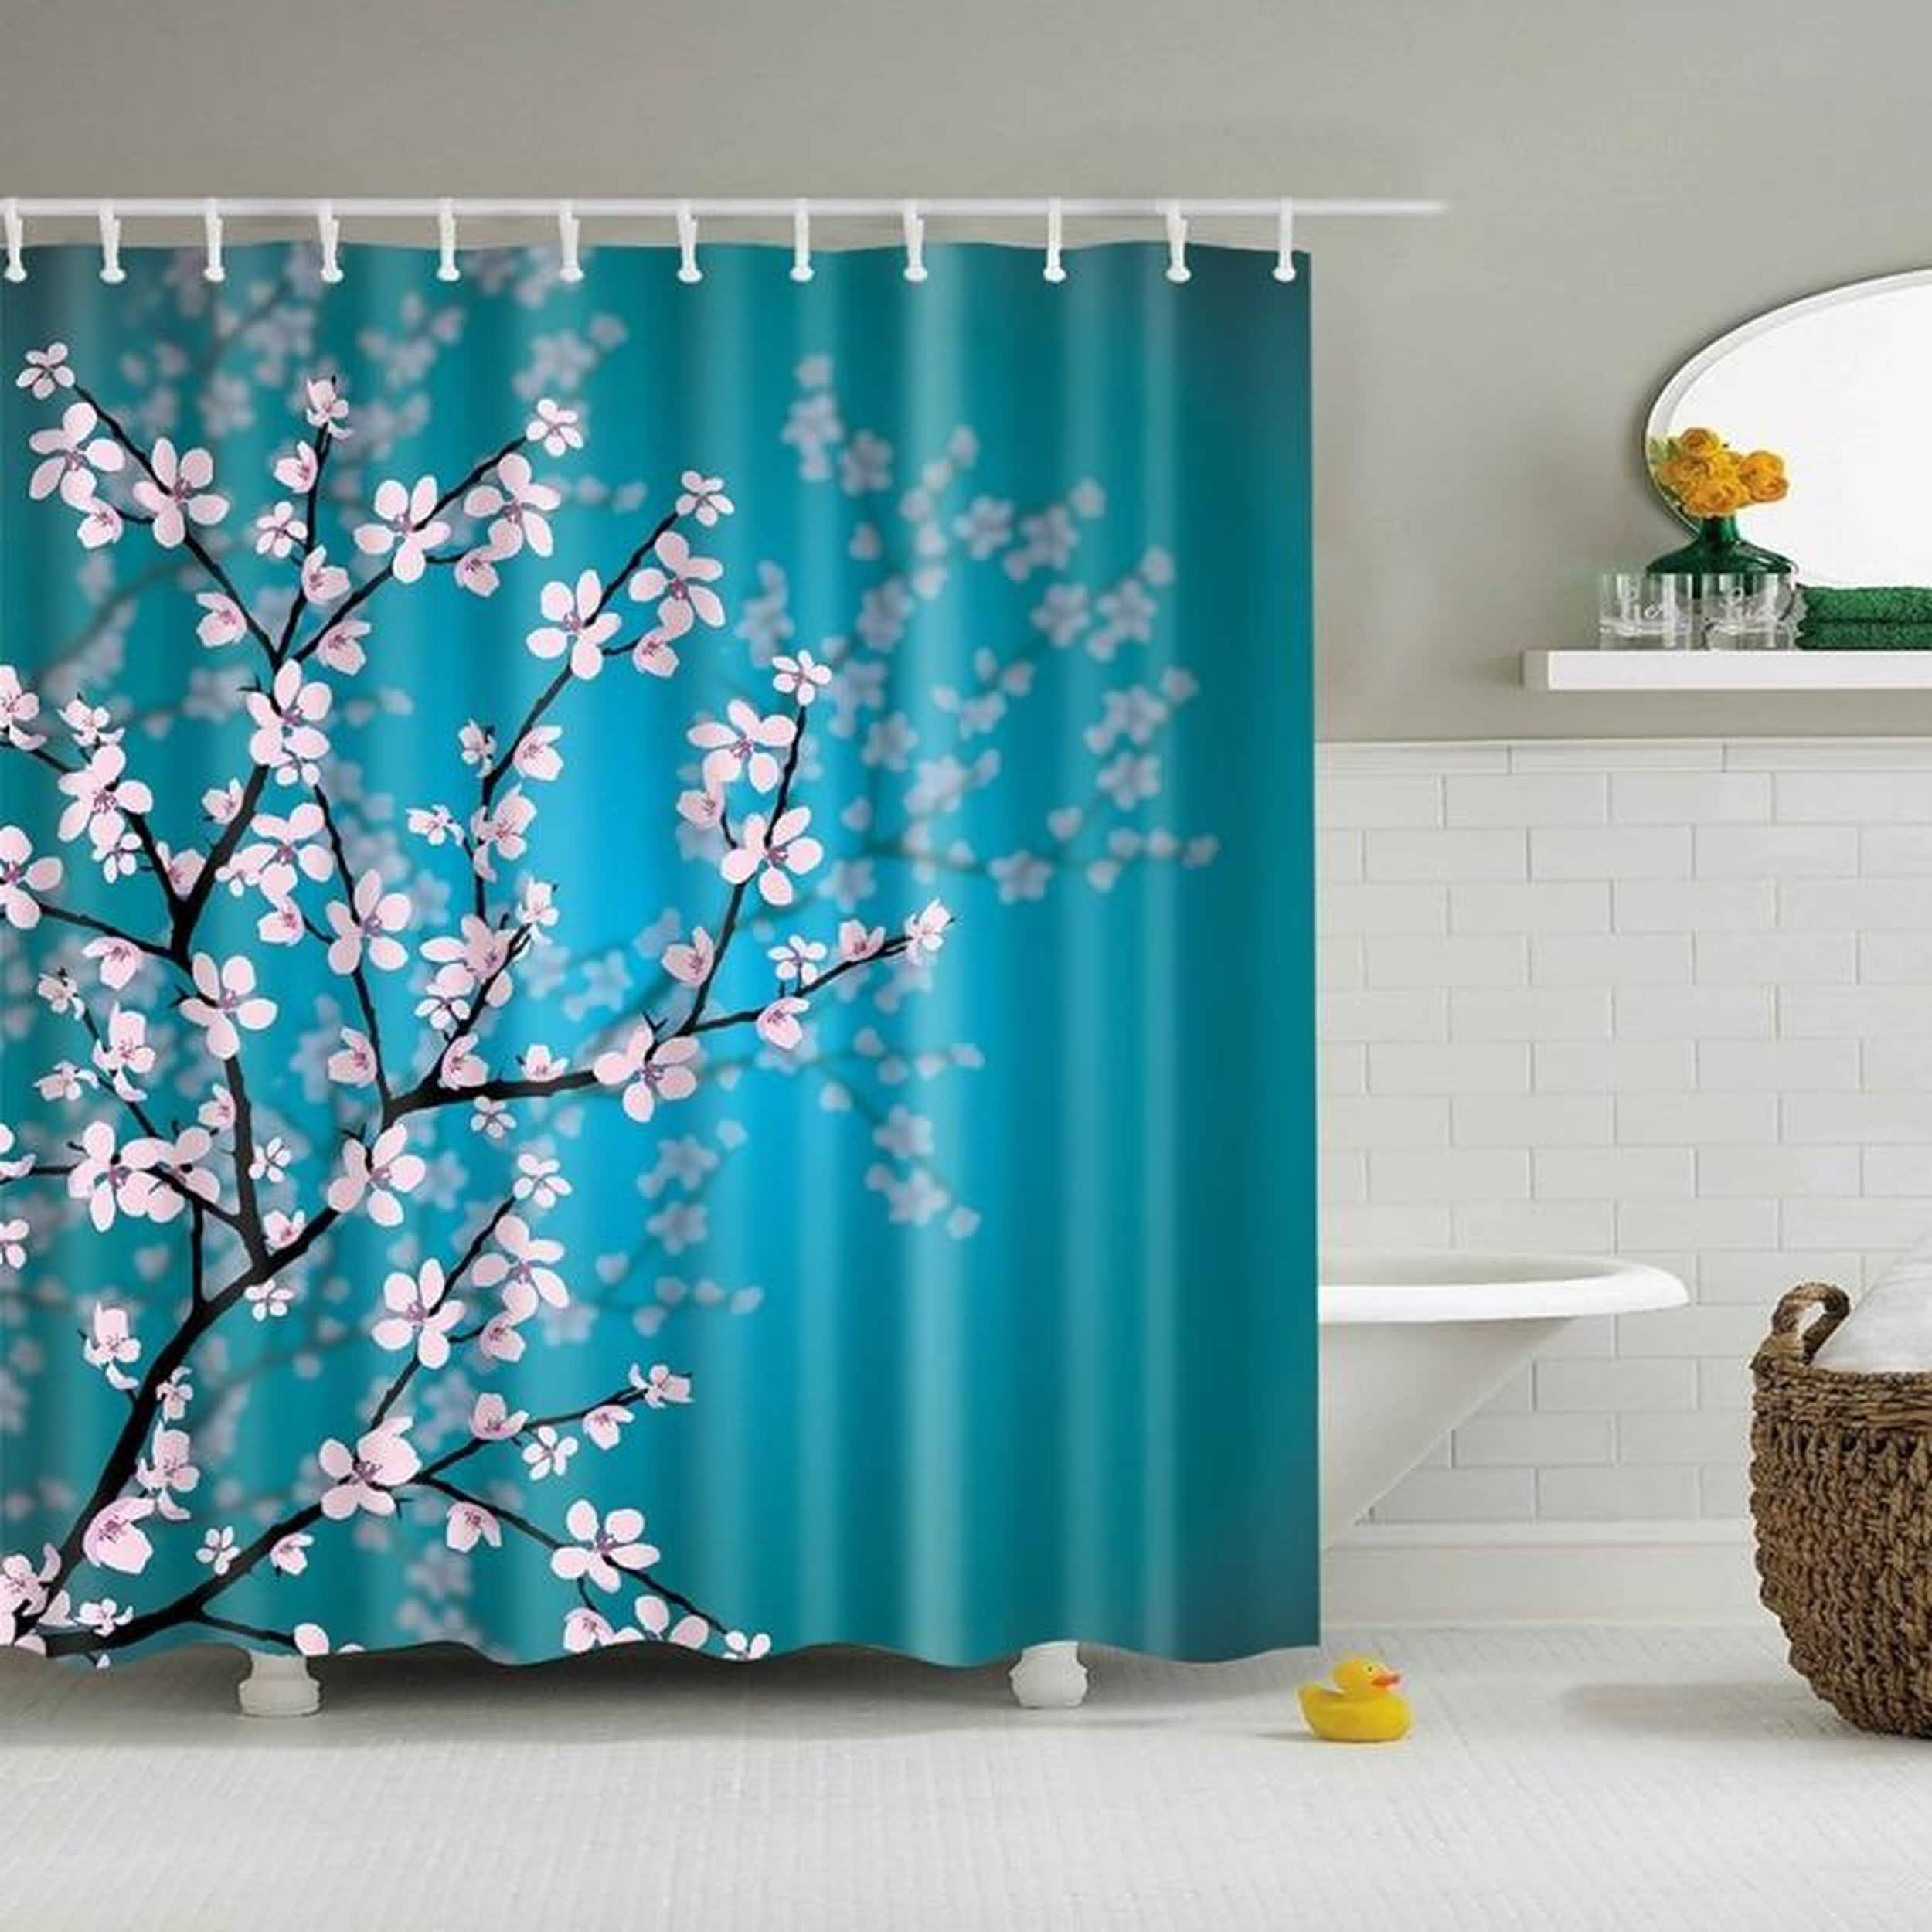 Shop Fabric Bathroom Decor Shower Curtain Pink Blossom Overstock 25353287